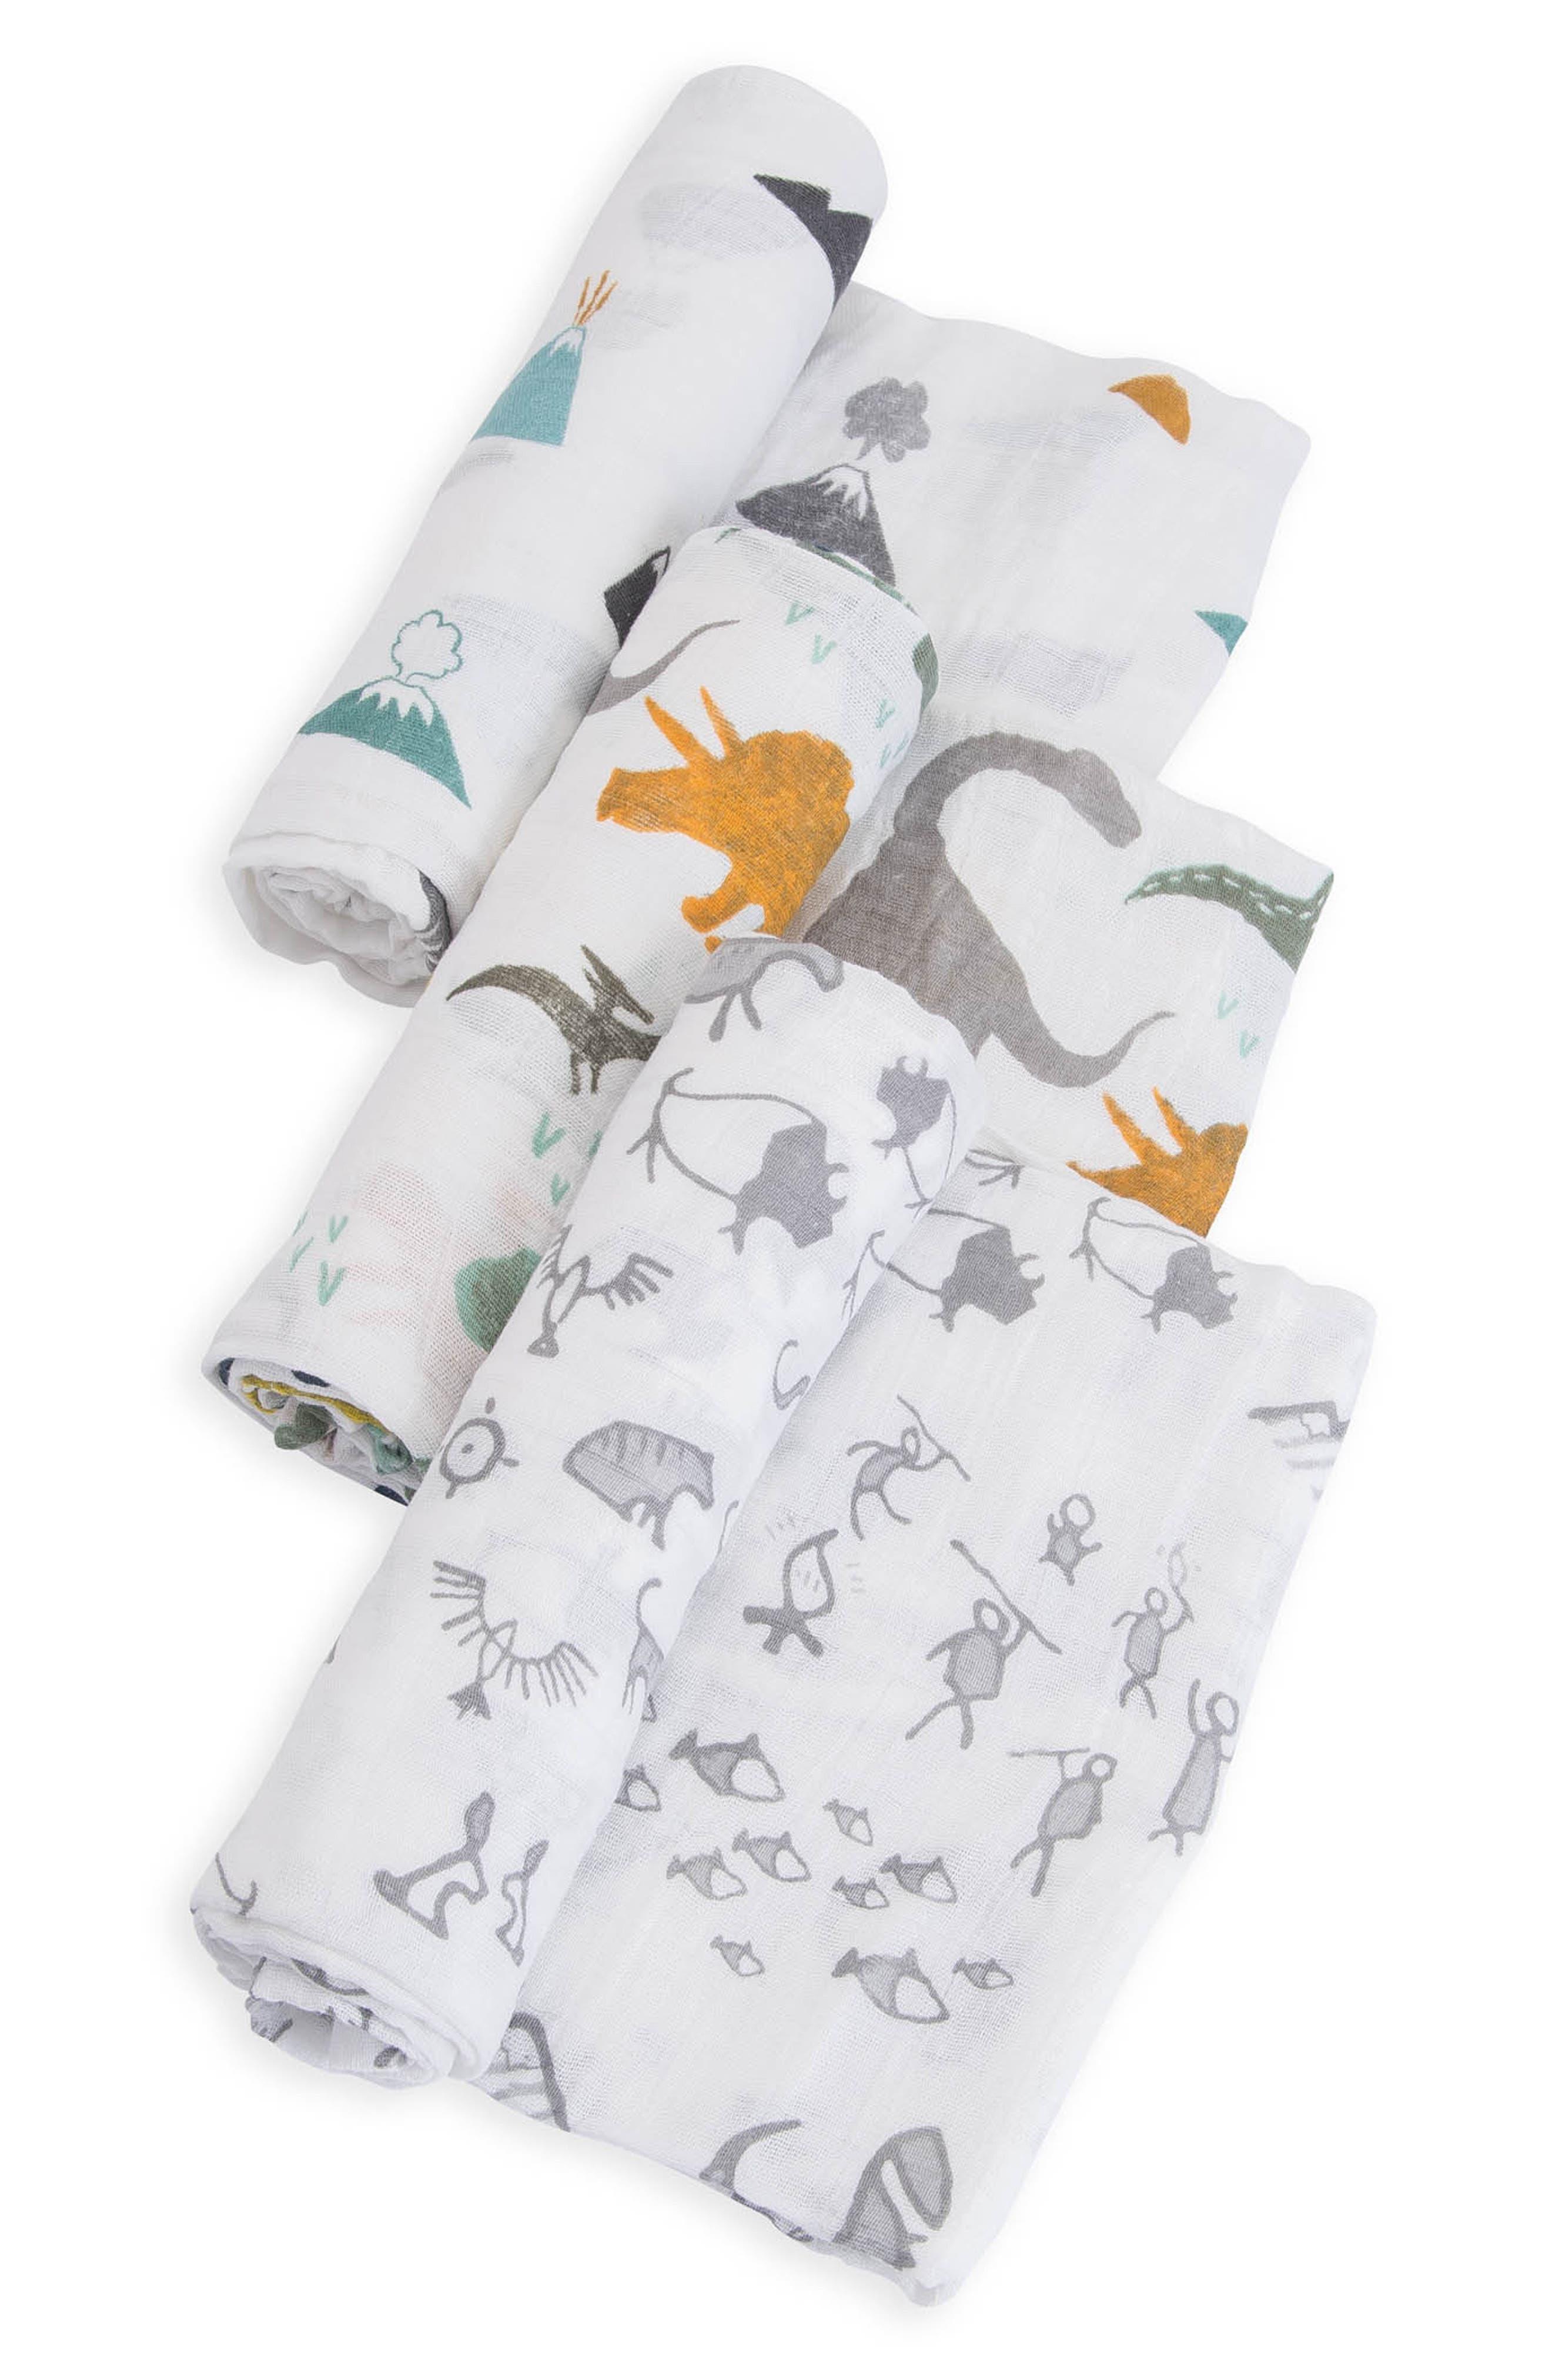 LITTLE UNICORN, 3-Pack Cotton Muslin Blankets, Alternate thumbnail 3, color, DINO FRIENDS